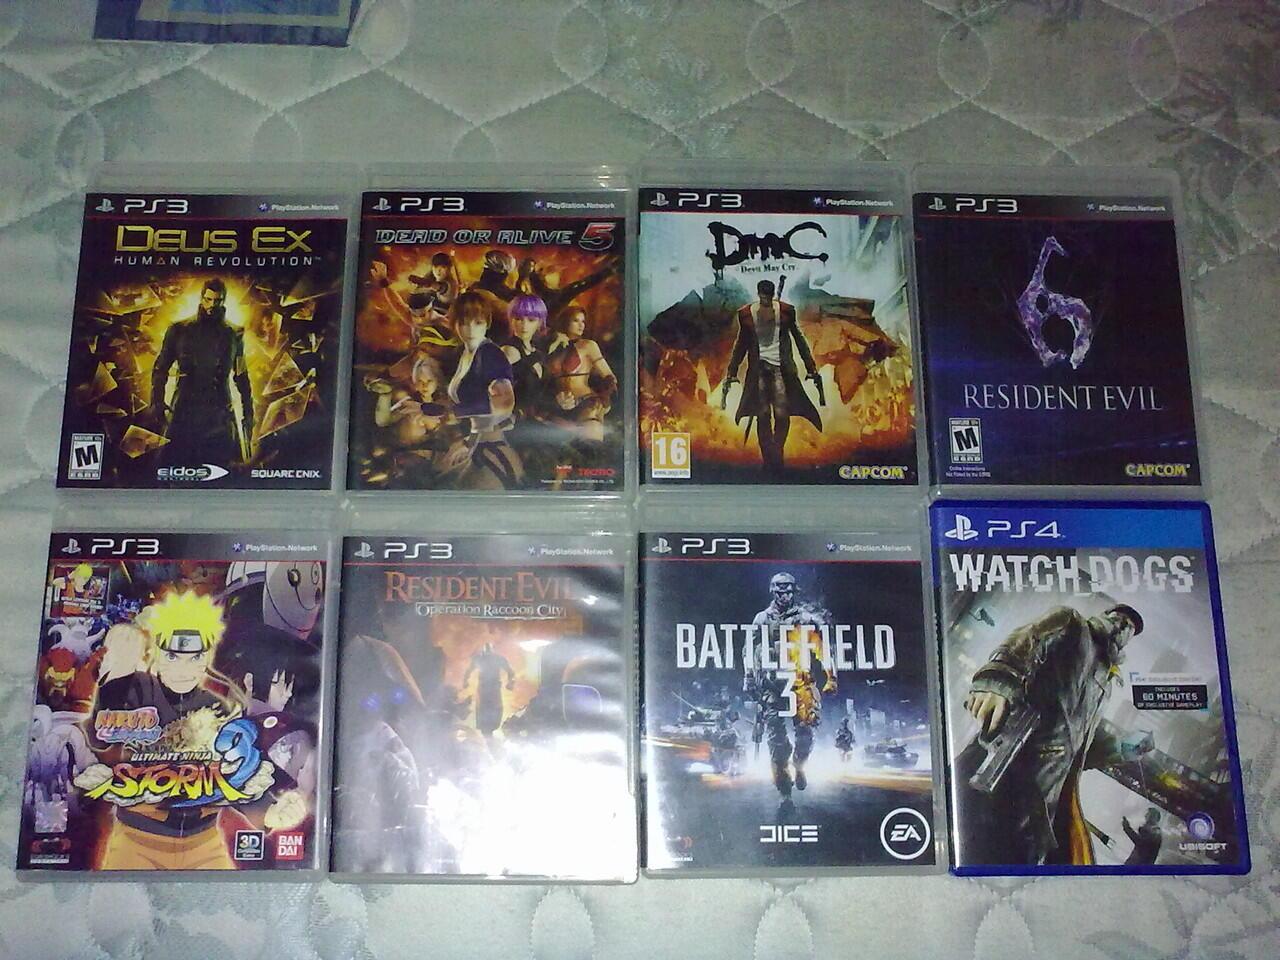 PS3 DMC5,DOA5,Resident Evil,Deus EX,Naruto,BF3 & PS4 Watchdogs